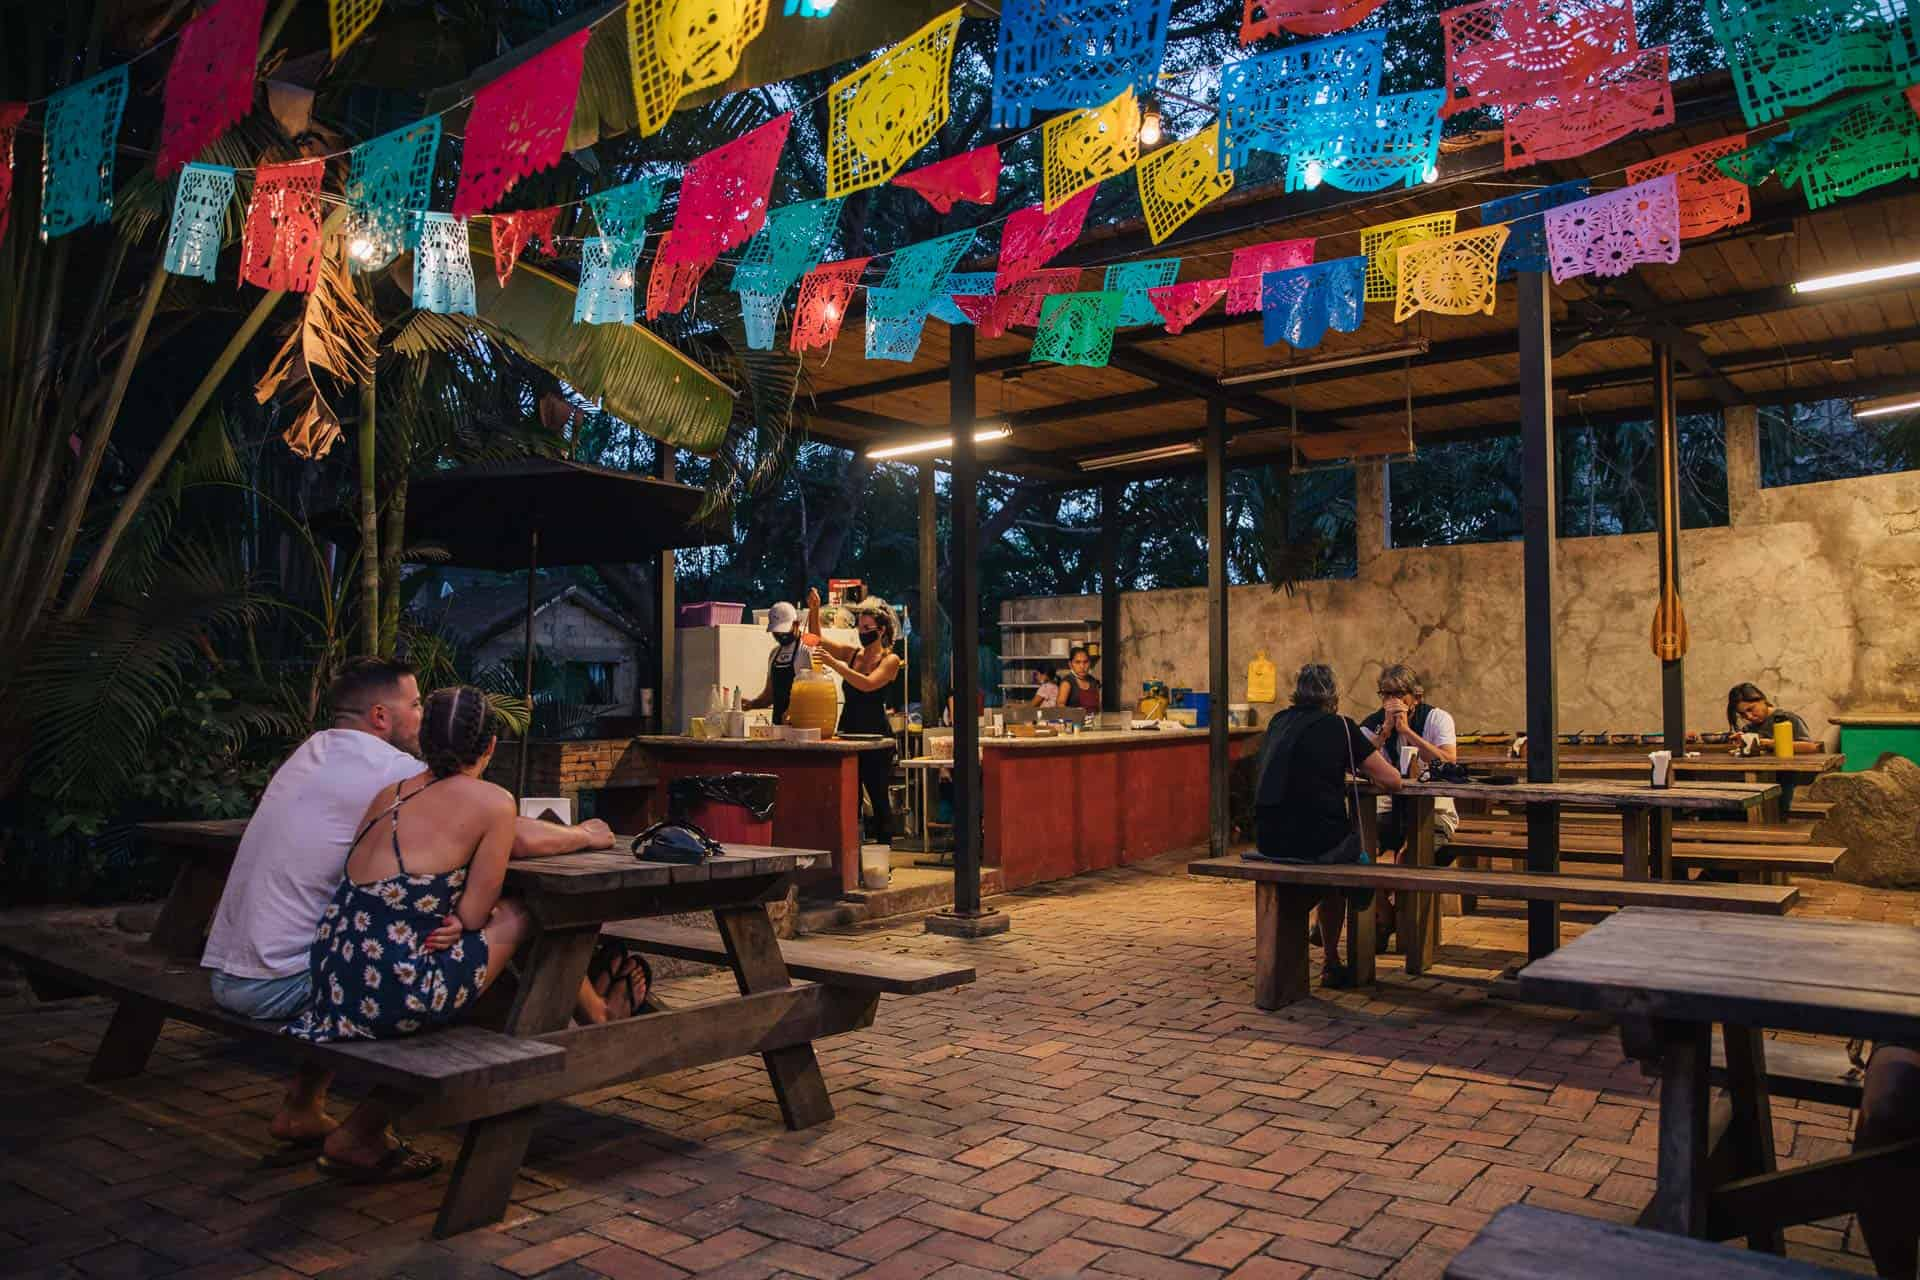 things to do in sayulita, sayulita mexico, what to do in sayulita, sayulita